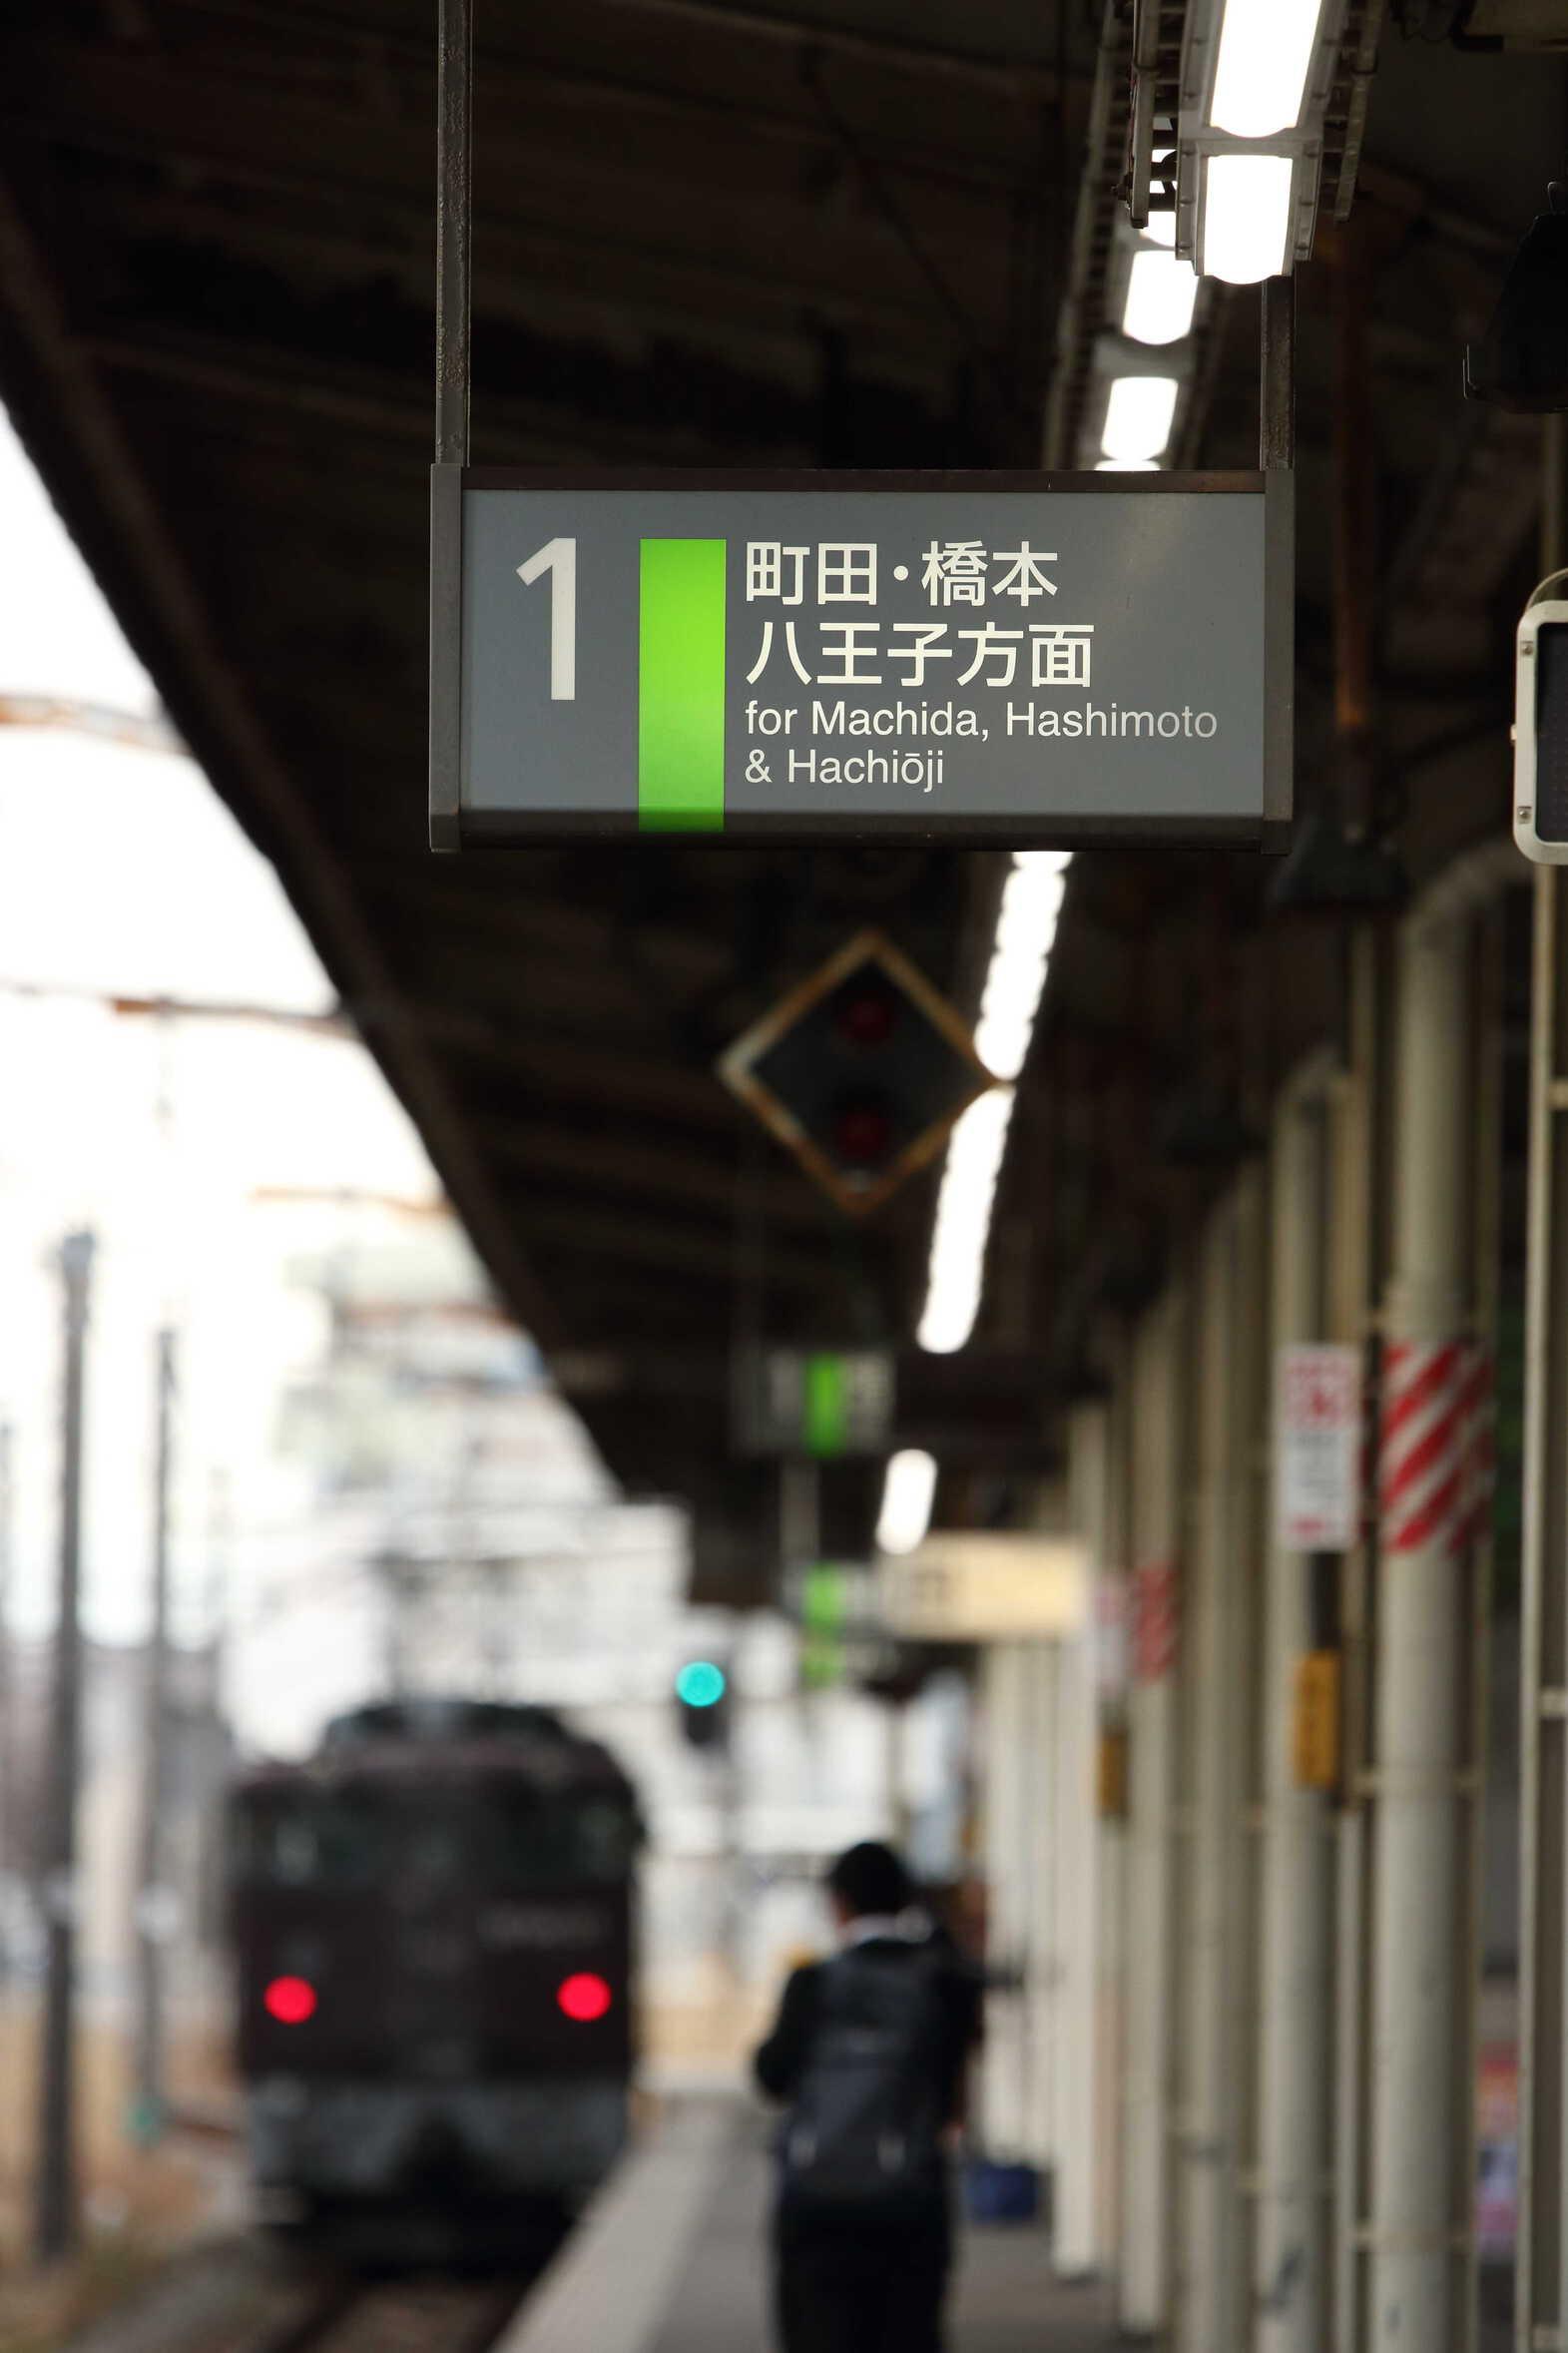 単9487列車 甲府運輸区横浜線ハンドル訓練 EF64-37[高]